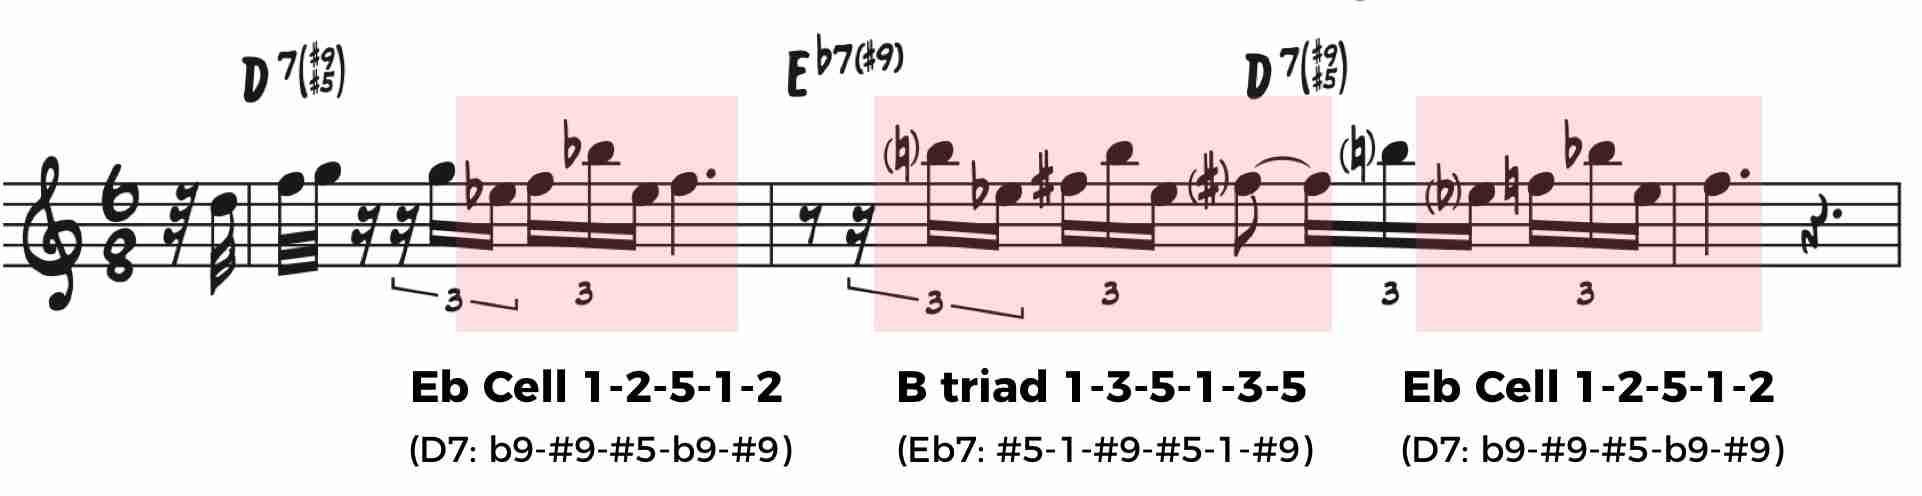 John Coltrane Cells in his jazz improvisation